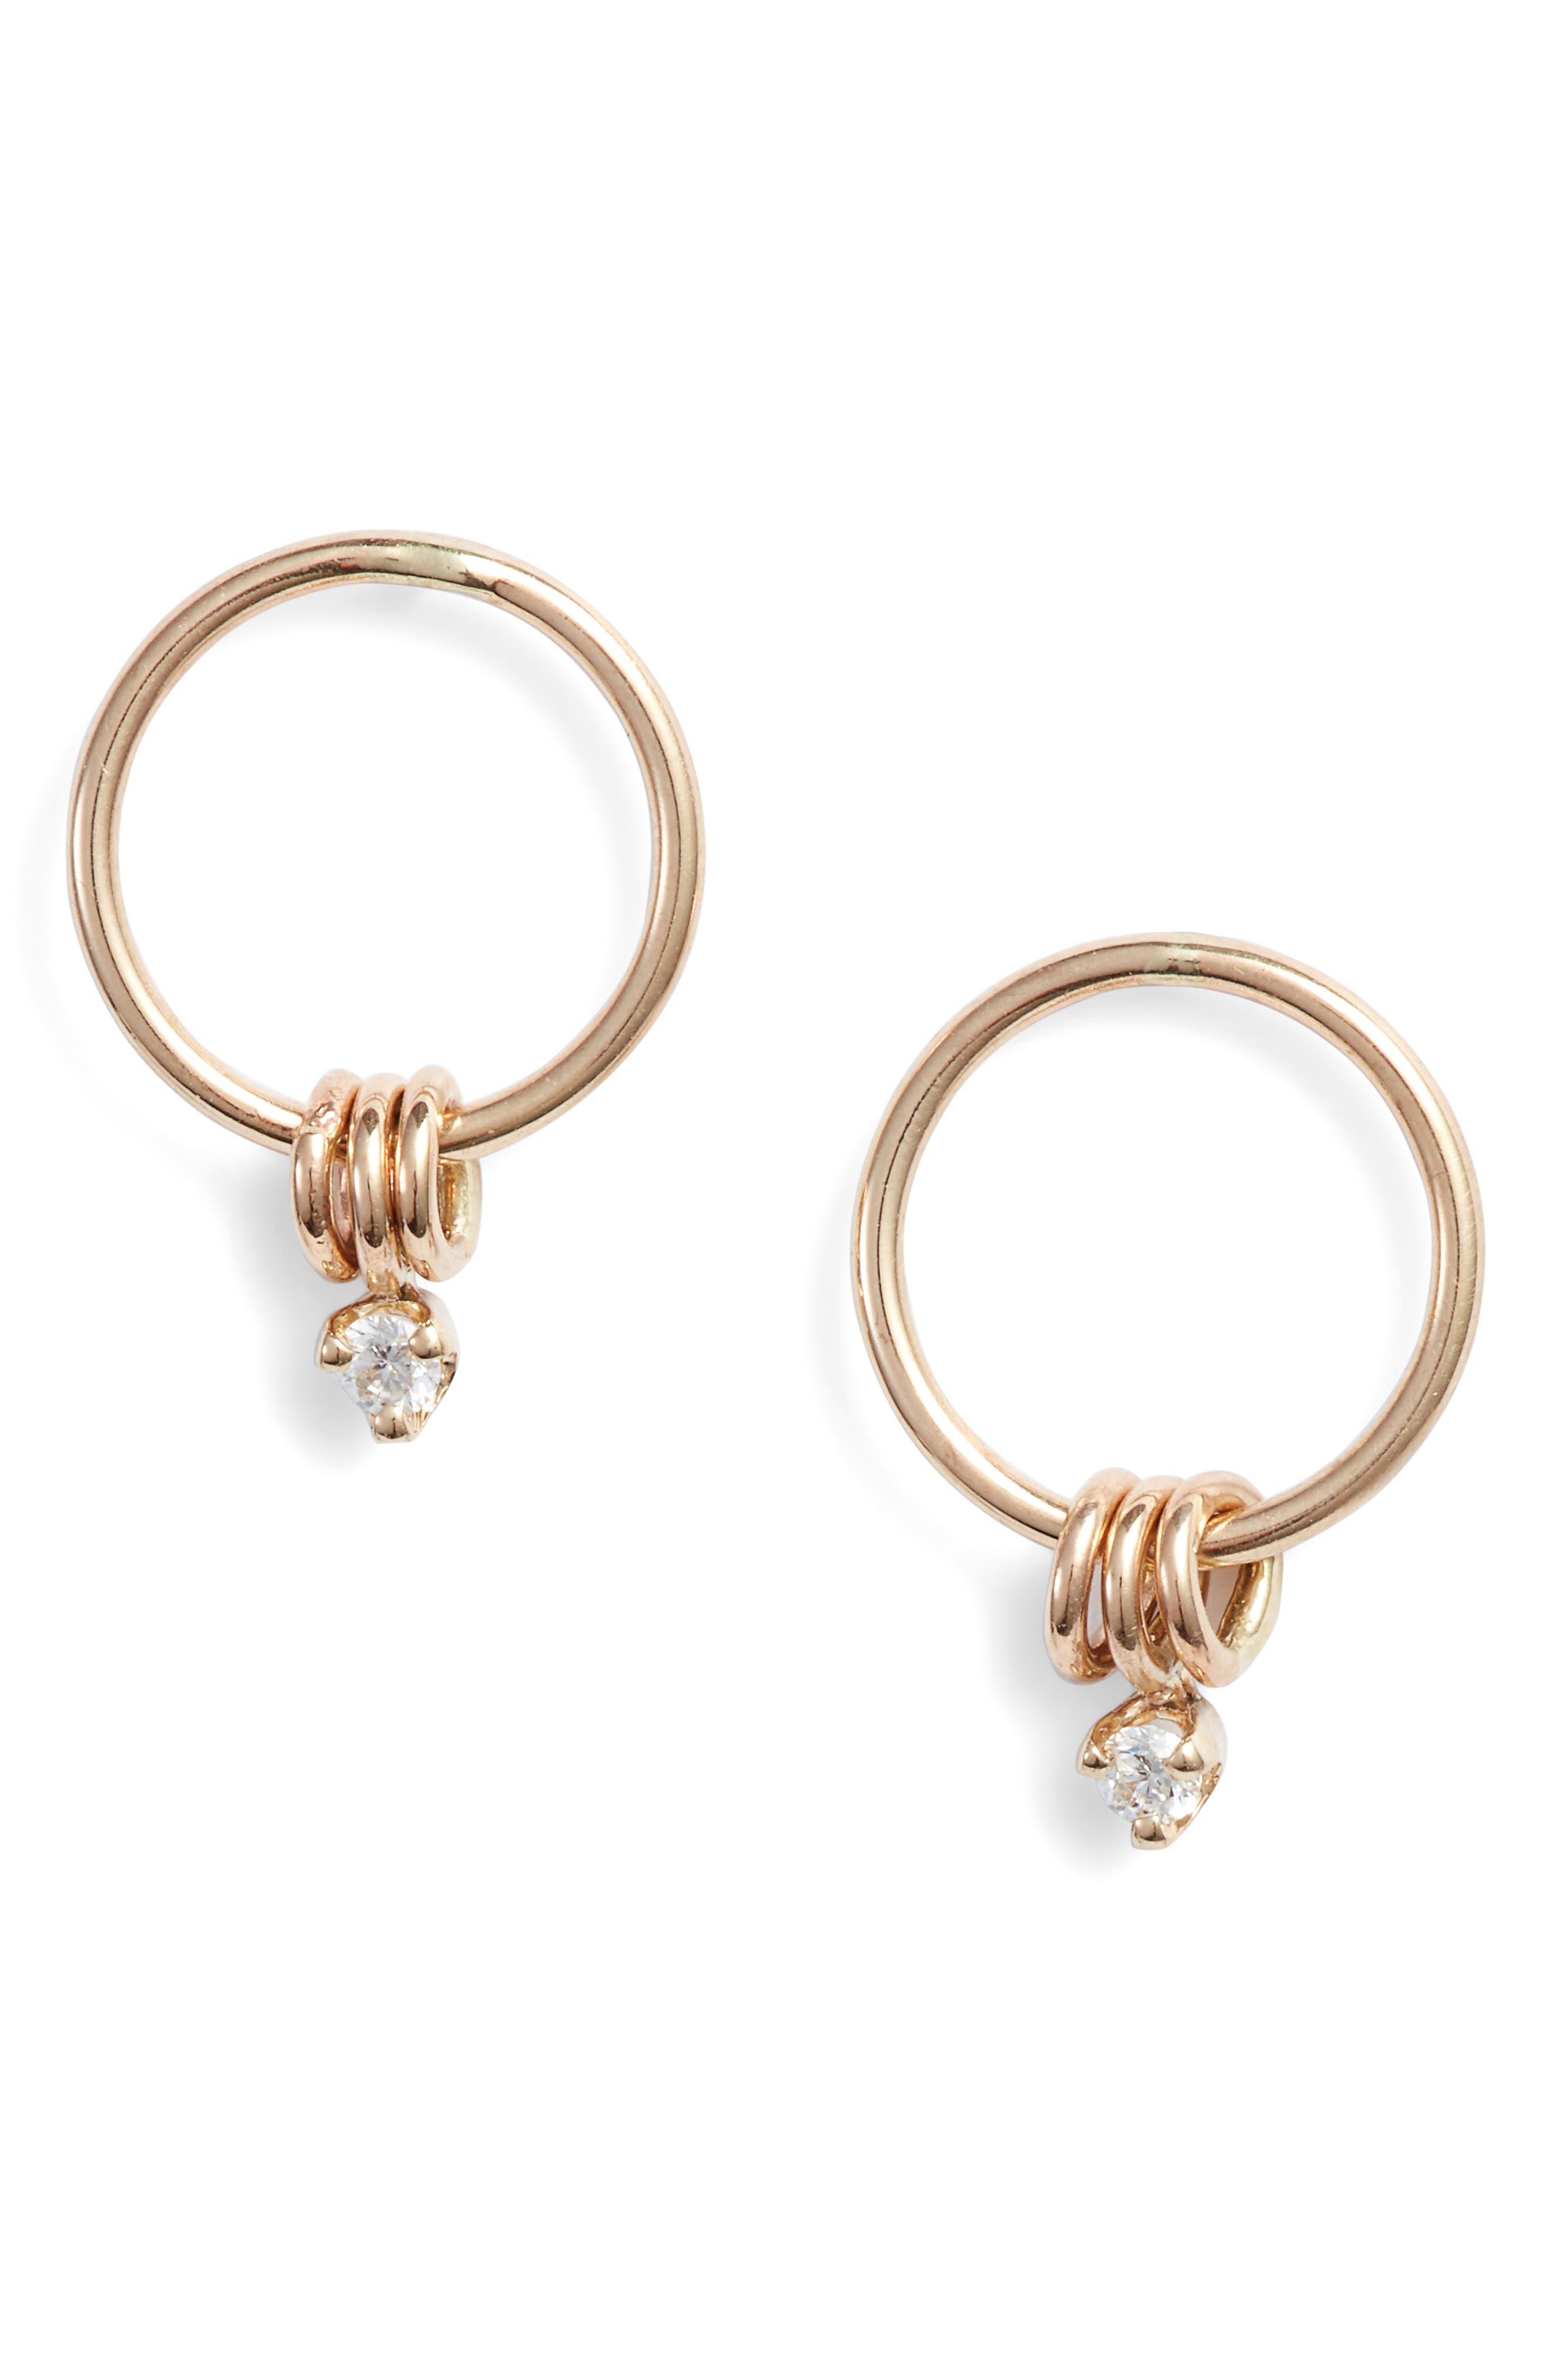 Zoe Chicco Small Diamond Circle Drop Earrings